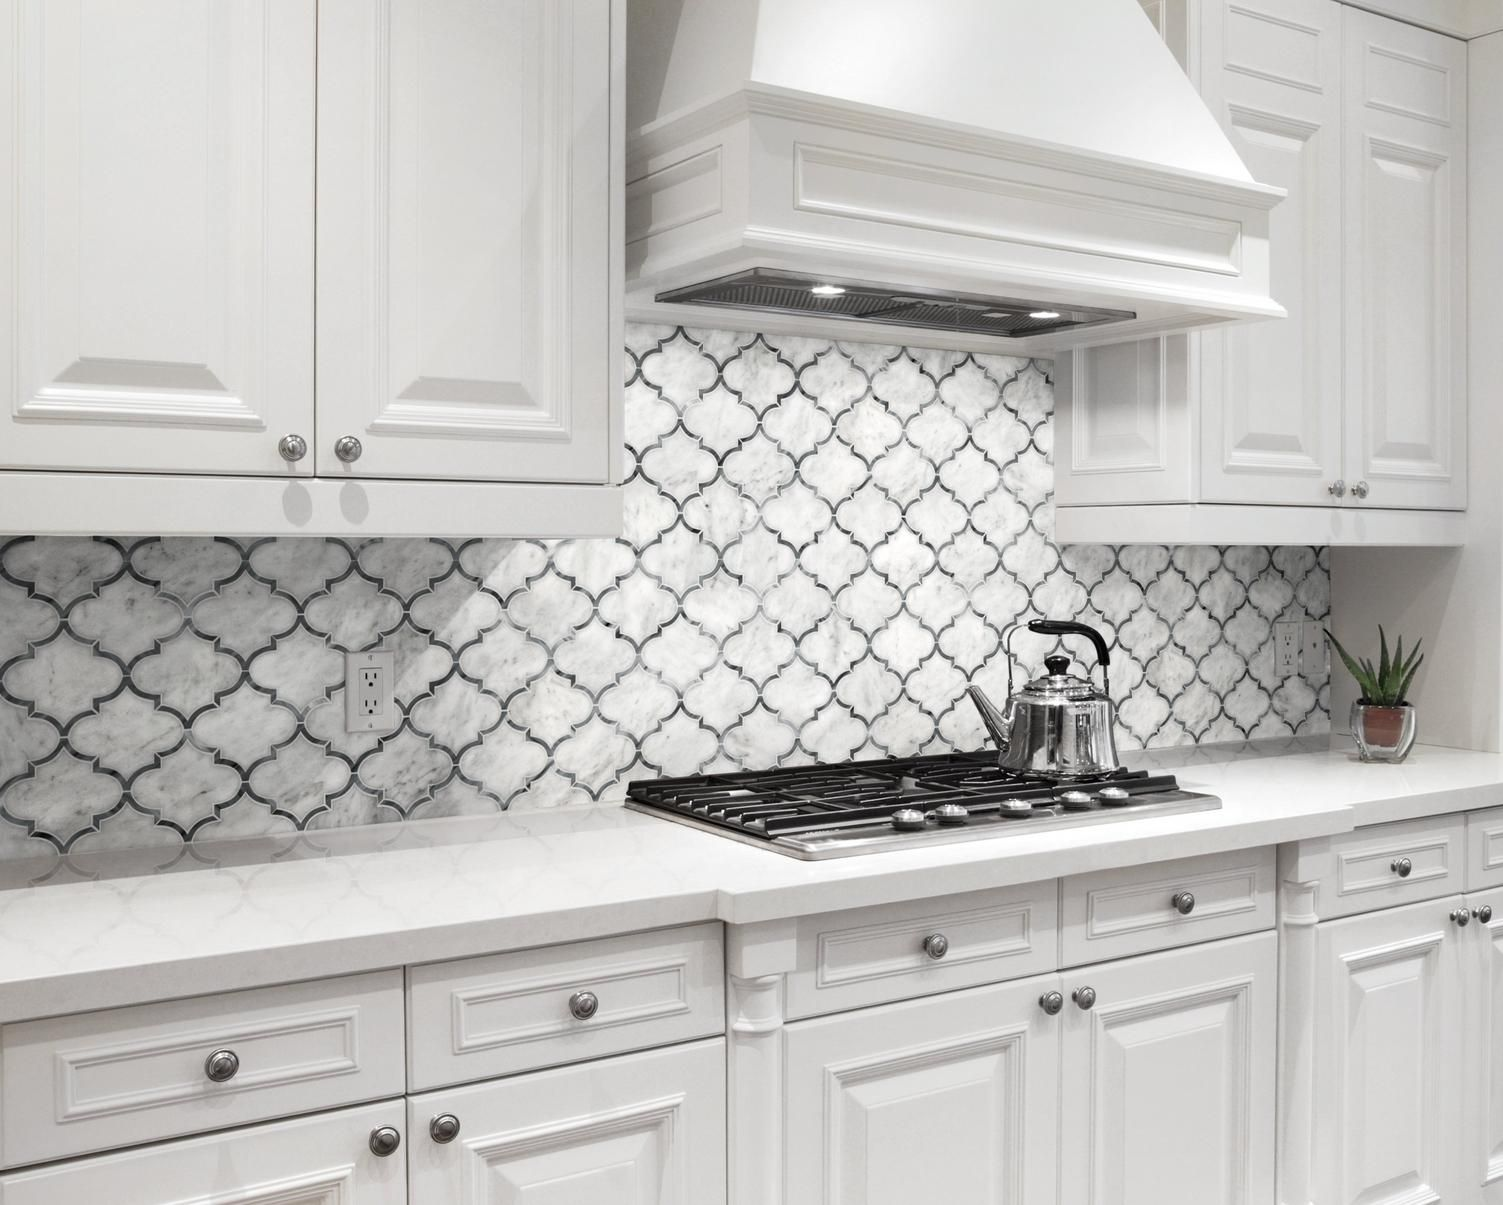 Backsplash Gallery Floor Decor Kitchen Remodel Waterjet